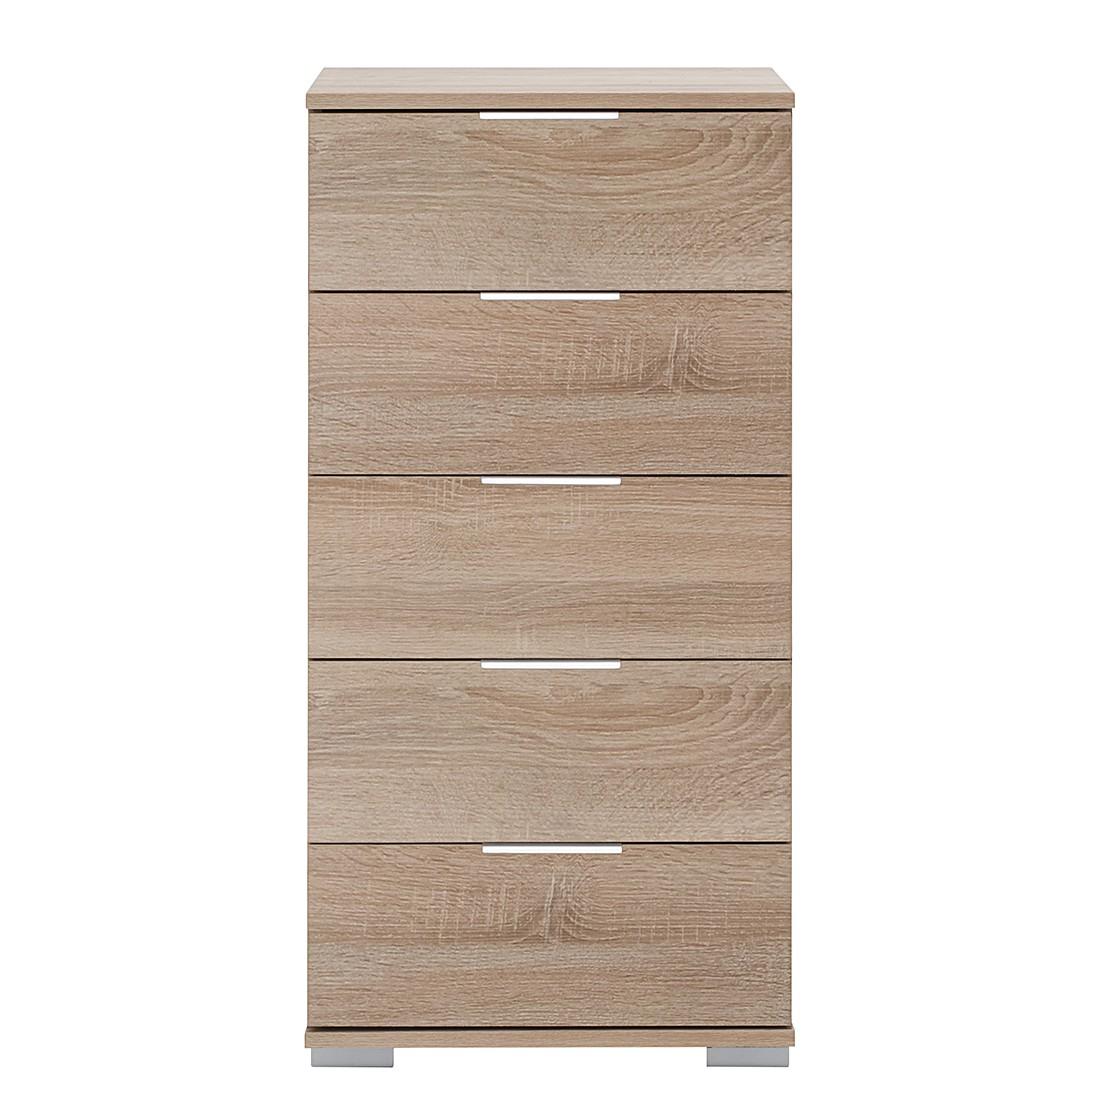 Commode à tiroirs Easy Plus II - Imitation chêne brut de sciage - Imitation chêne brut de sciage, Wi